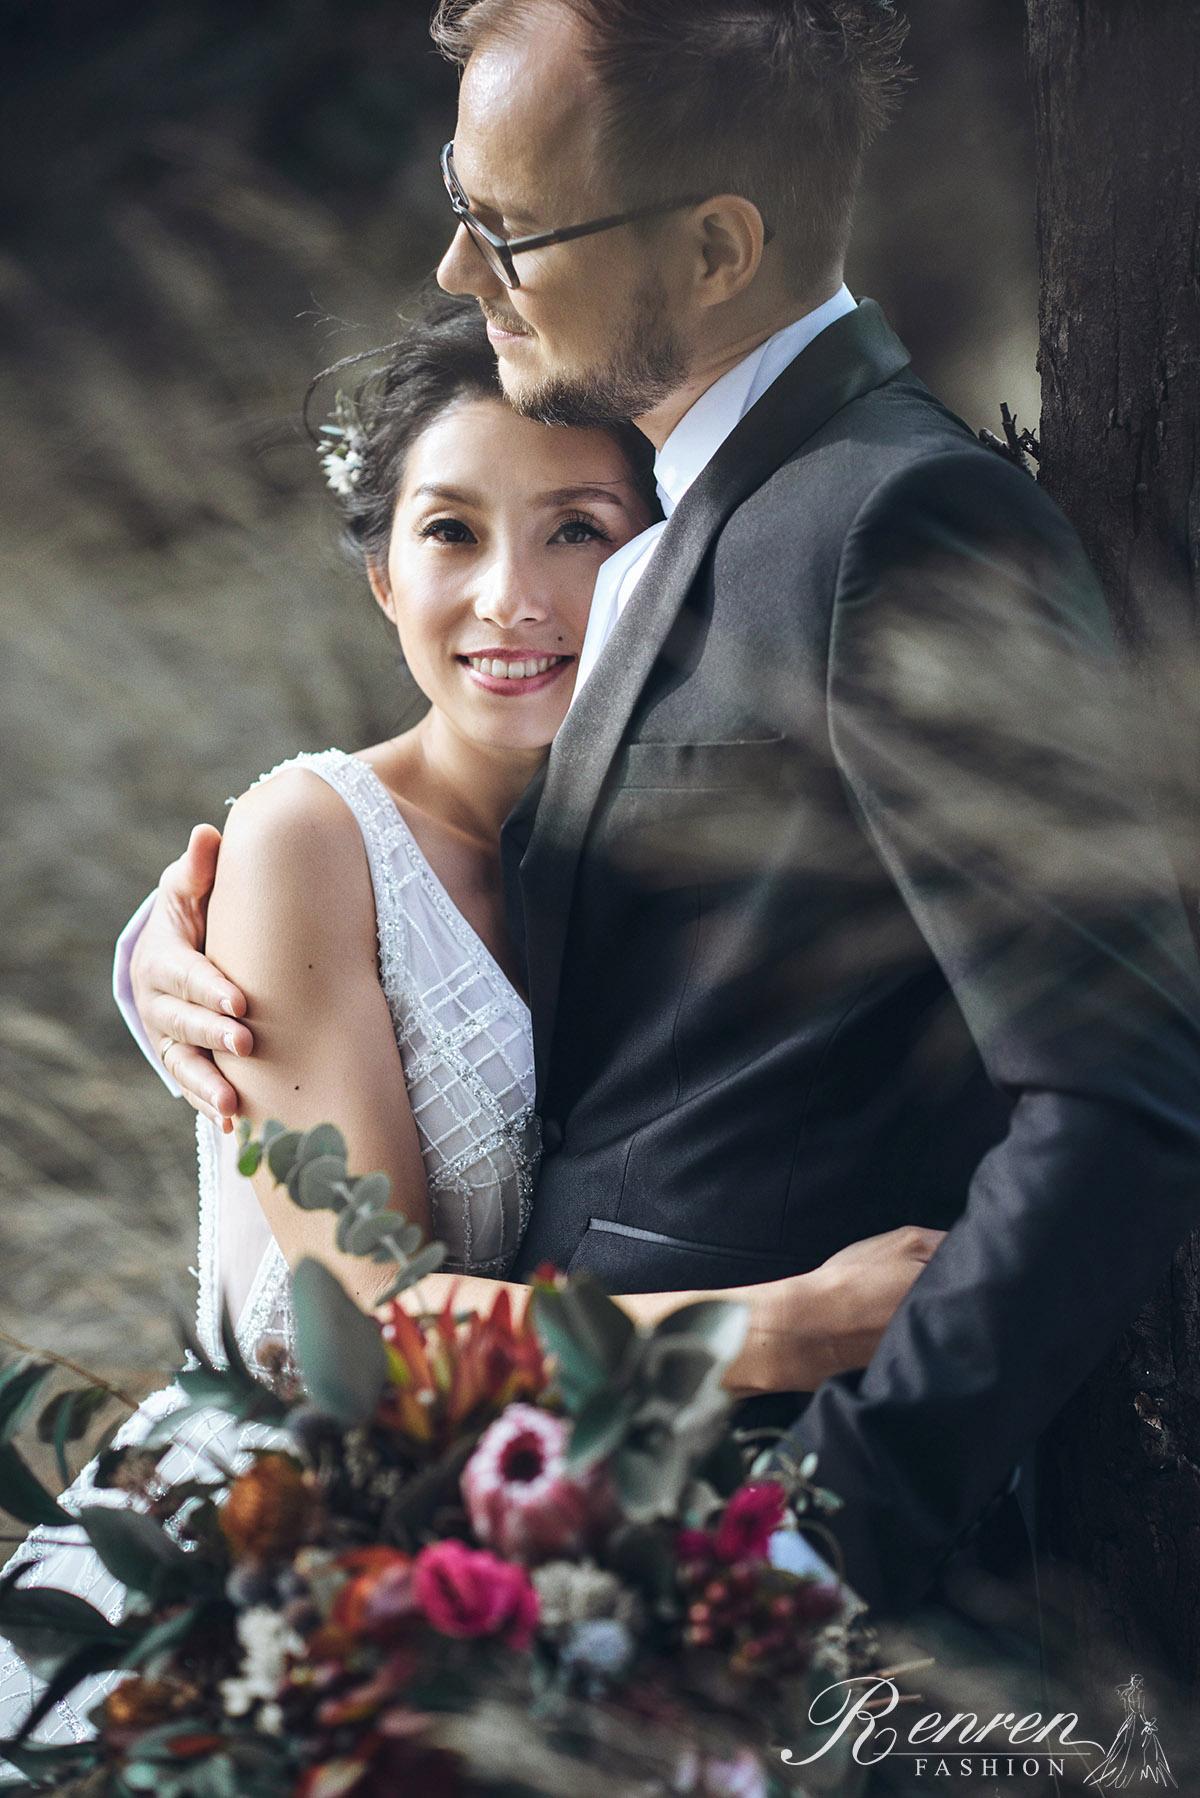 RenRenBridal-冉冉婚紗-MUNDO慕朵影像-StylistMei-美式婚紗-彰濱-台中